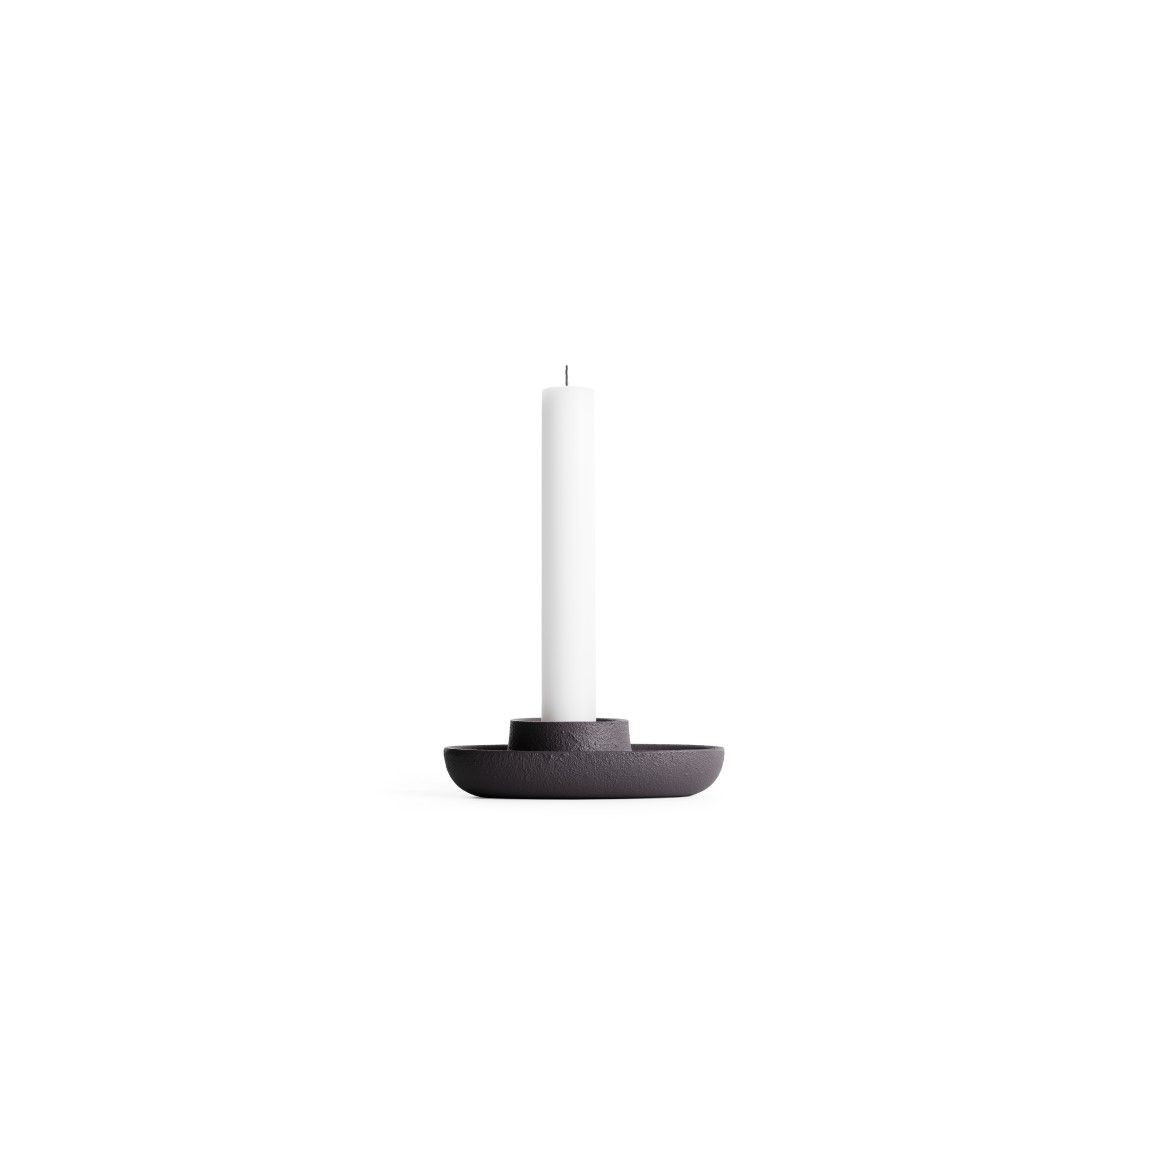 Kerzenhalter für 1 Kerze   Schwarz